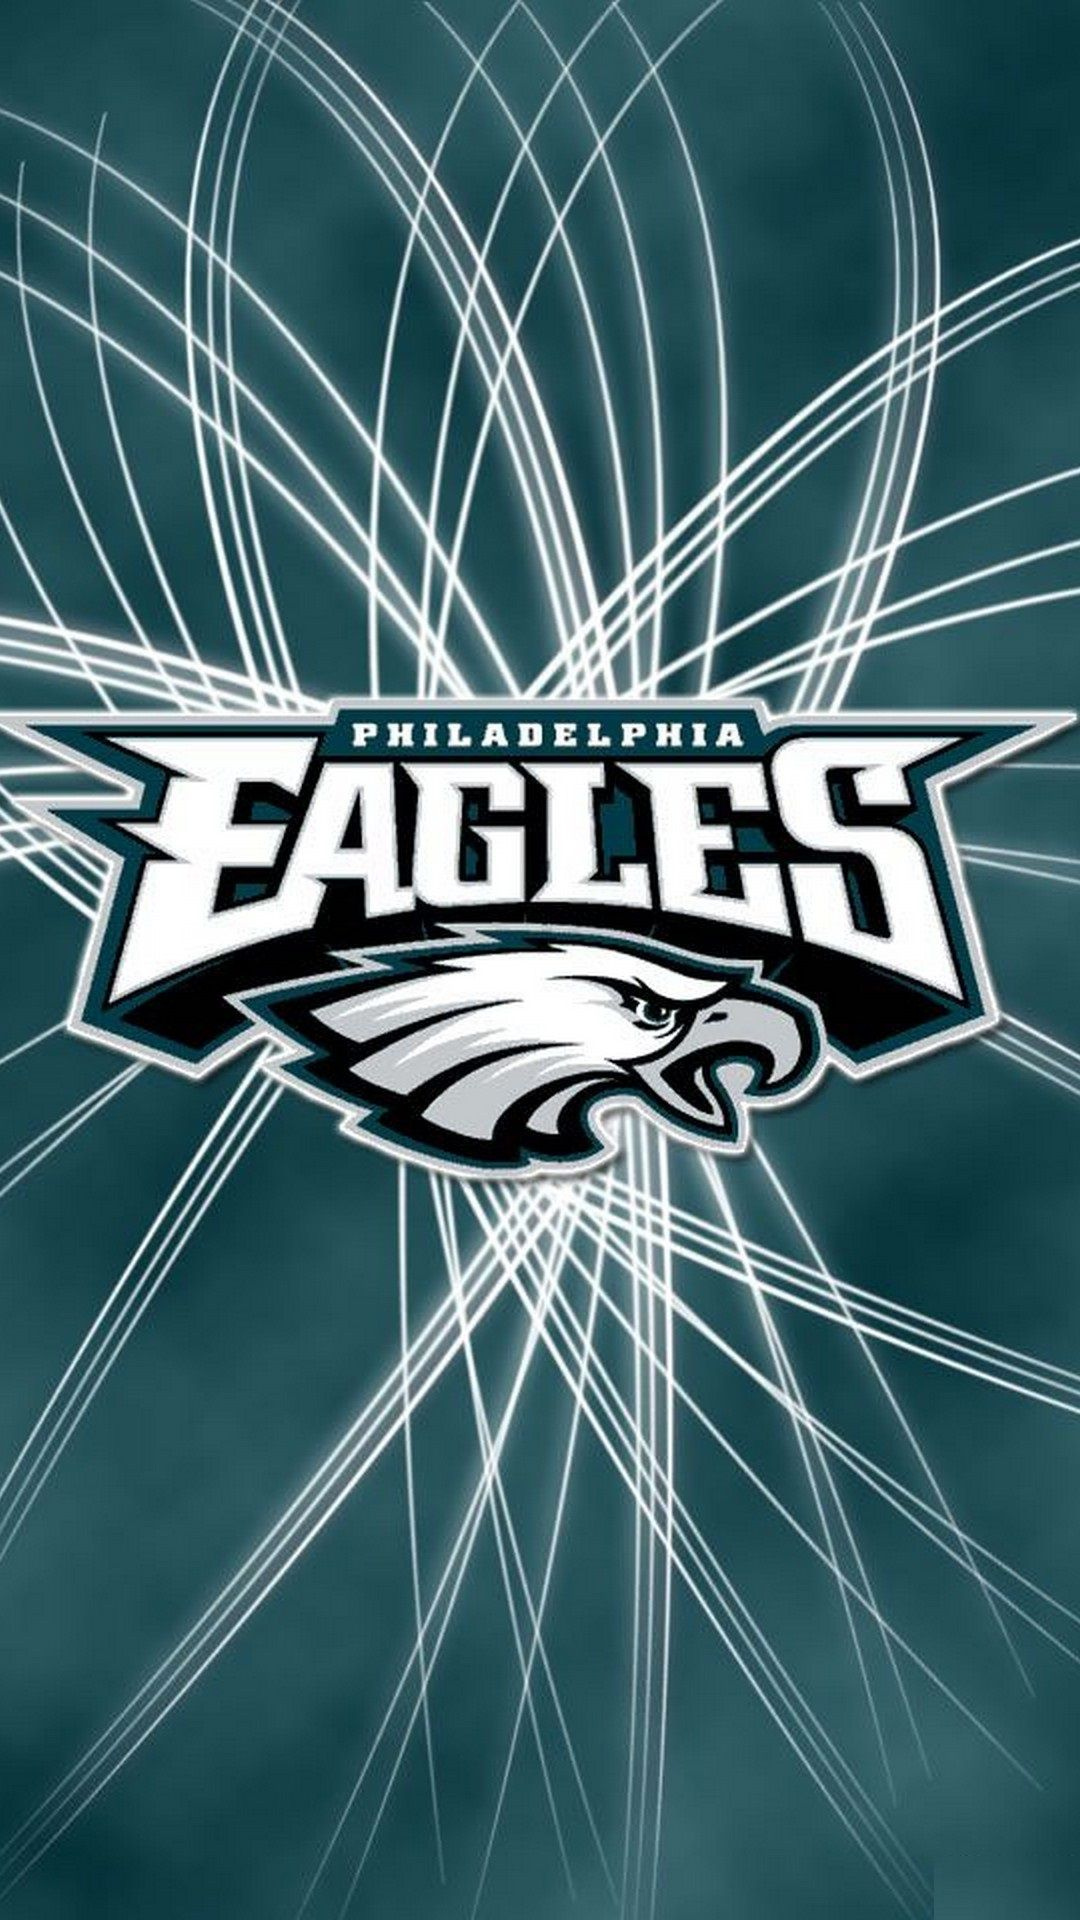 Phila Eagles Iphone 7 Plus Wallpaper 2020 Nfl Football Wallpapers Philadelphia Eagles Football Philadelphia Eagles Wallpaper Eagles